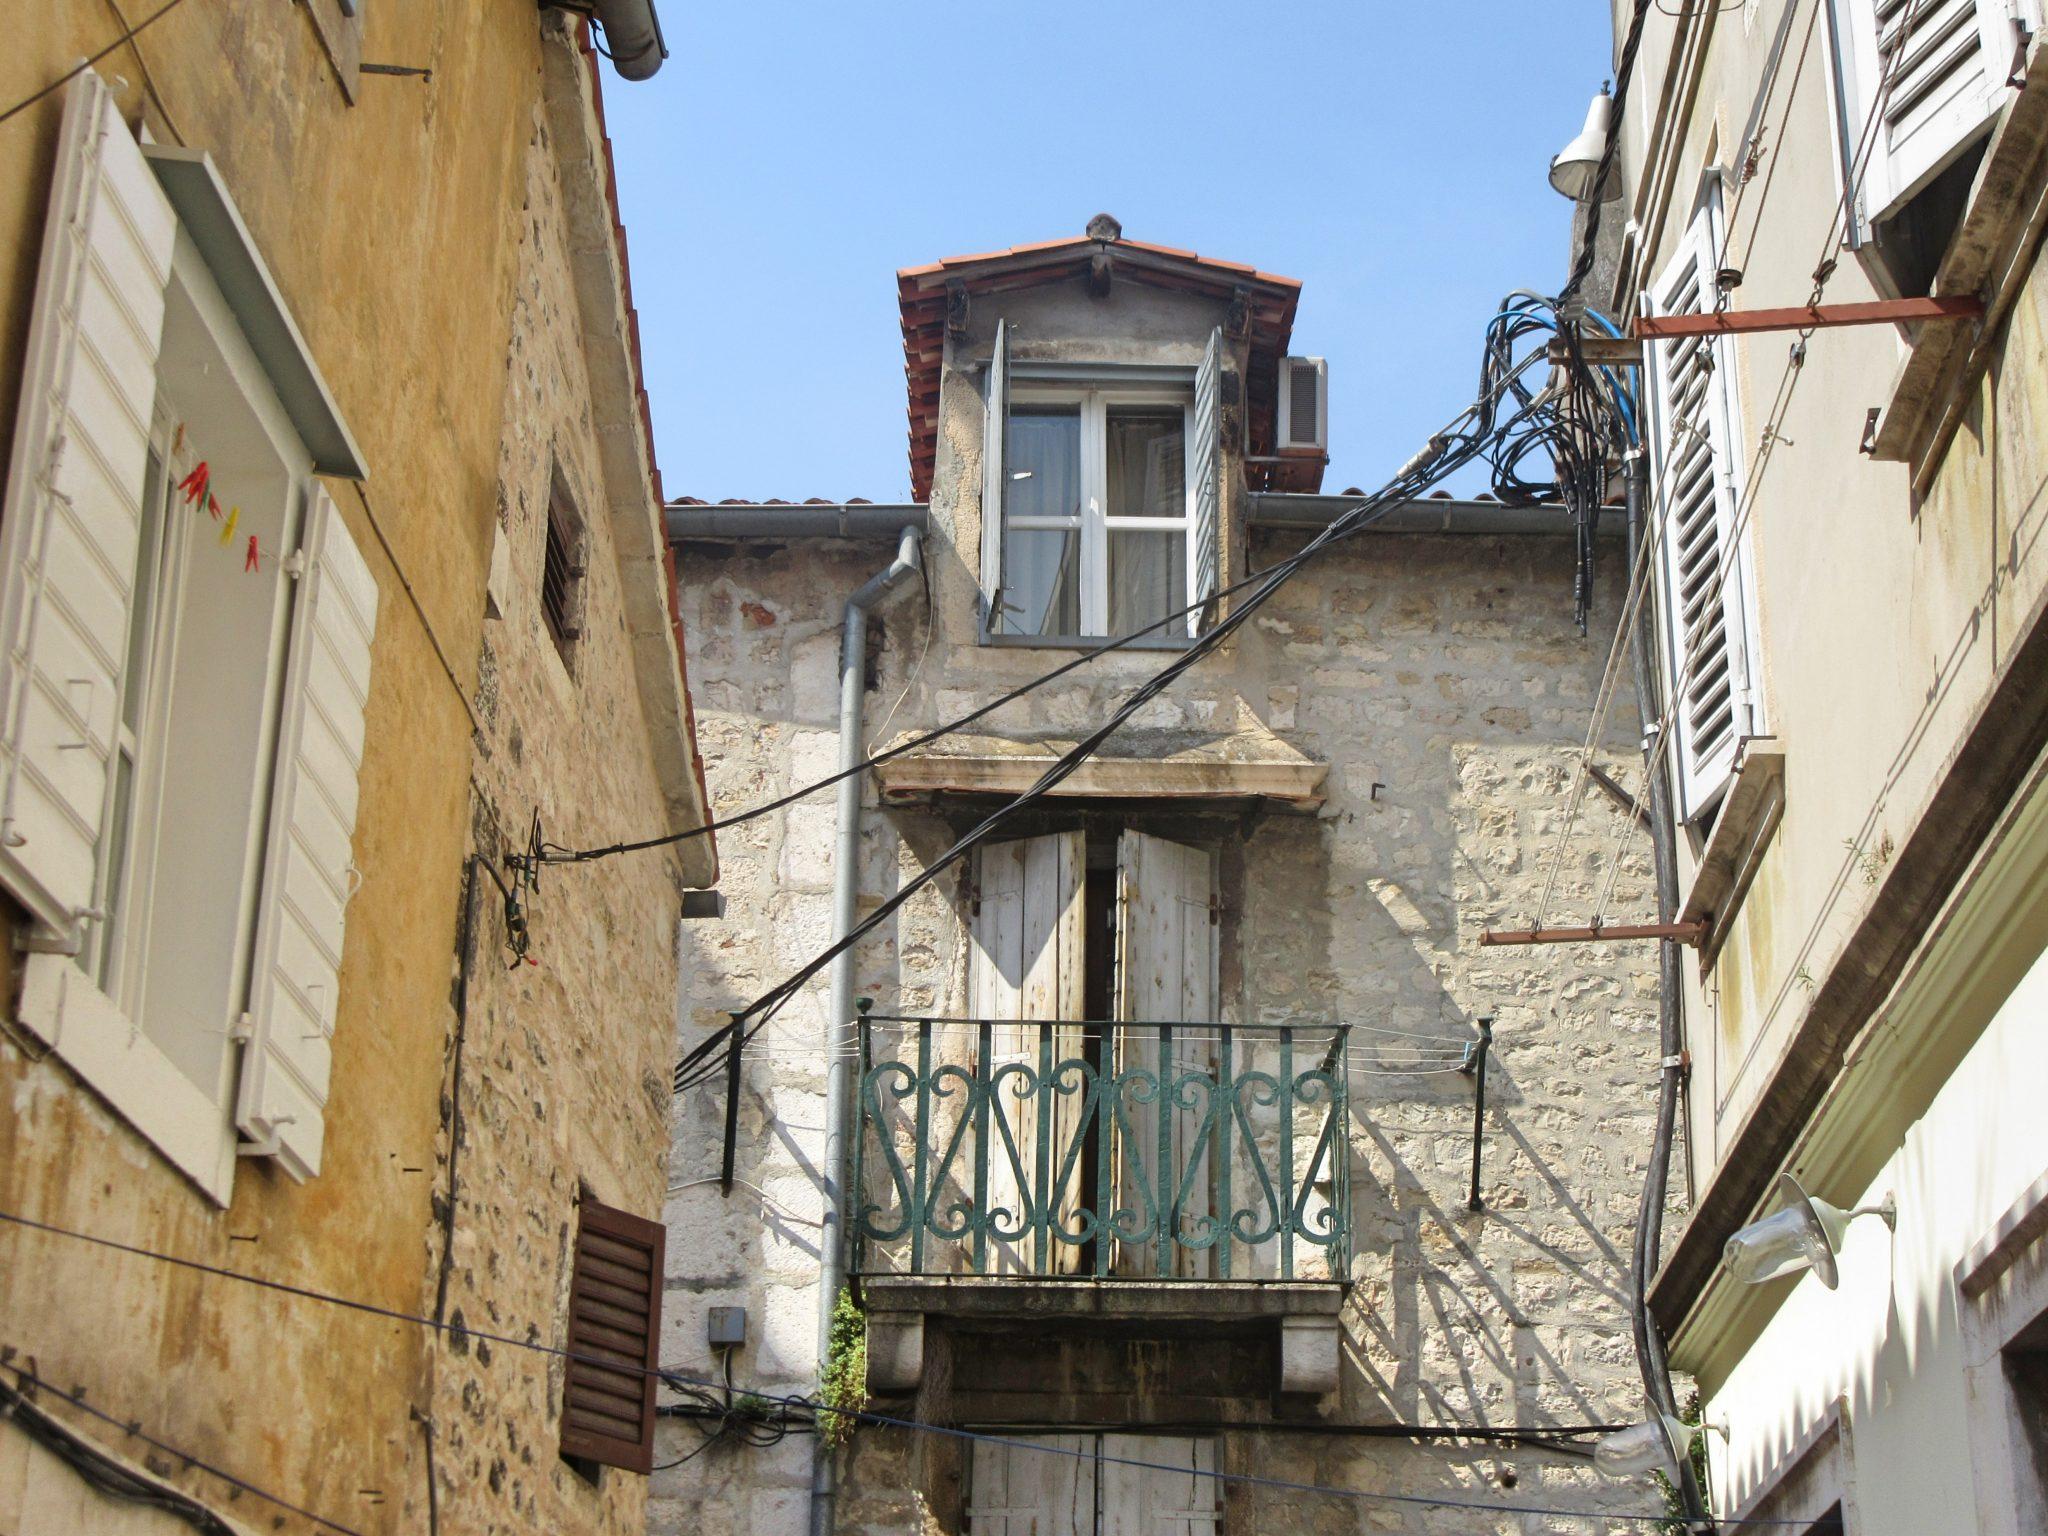 Architecture in Split, Croatia